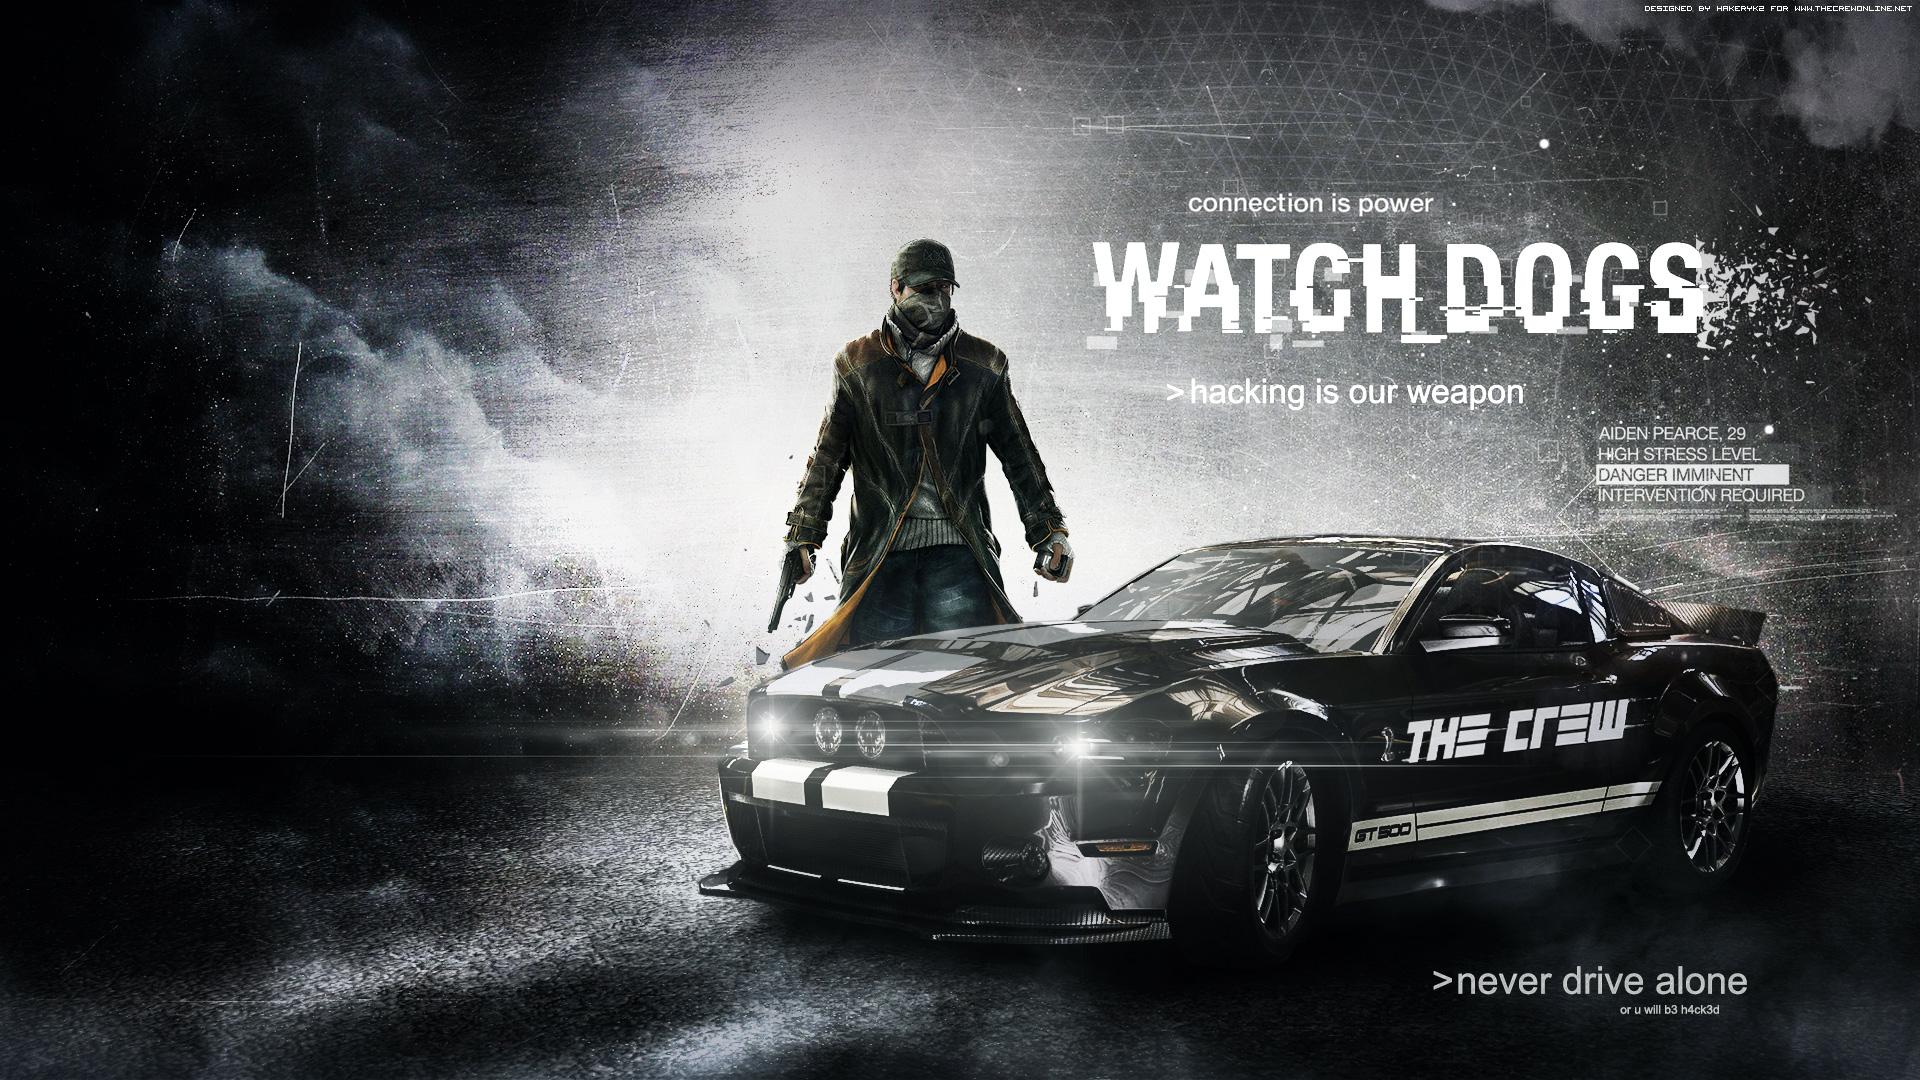 Watch Dogs Wallpapers - WallpaperSafari